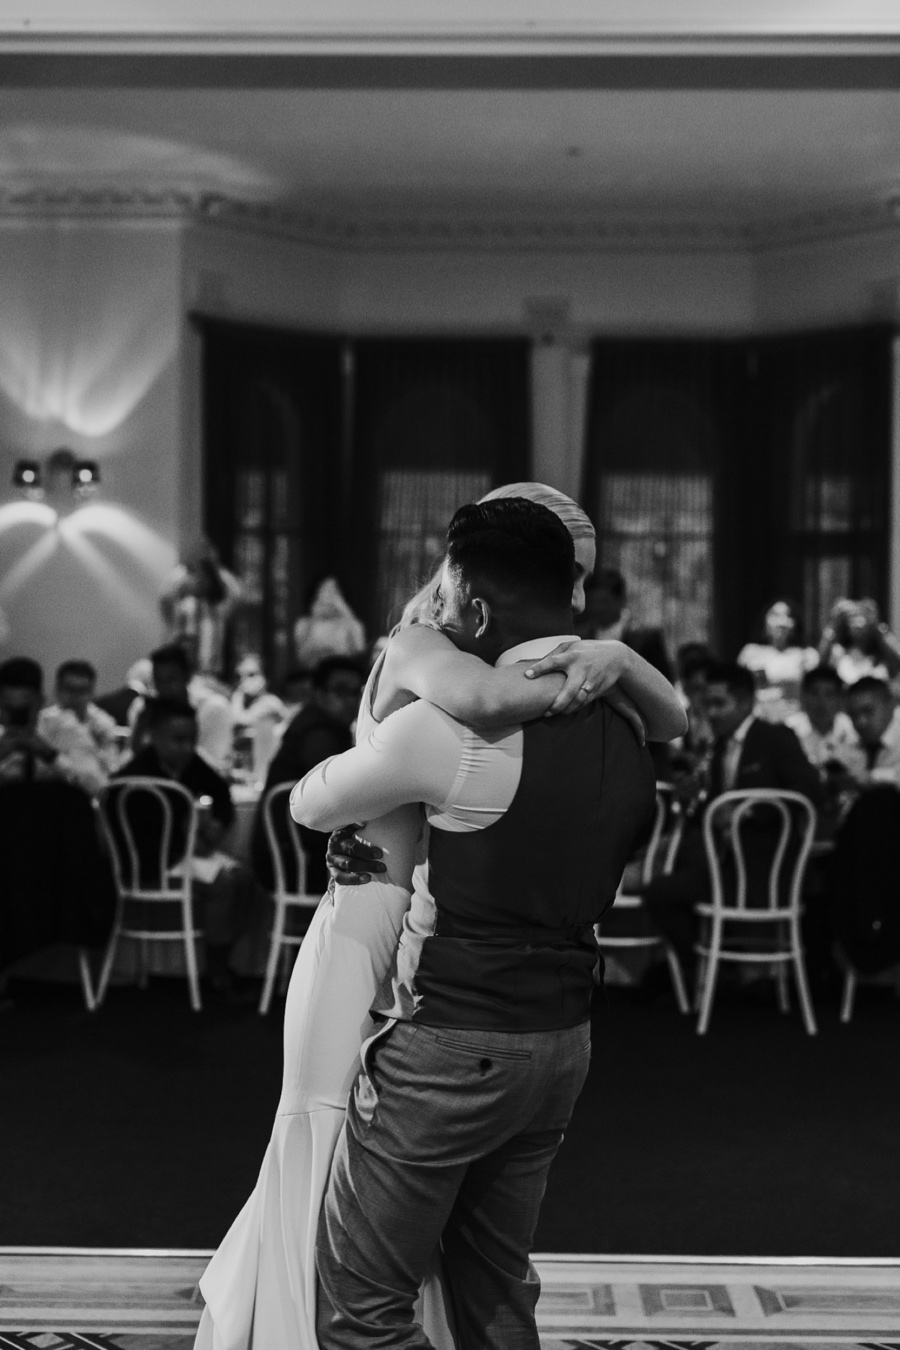 Quat Quatta Melbourne Wedding Photography97.jpg